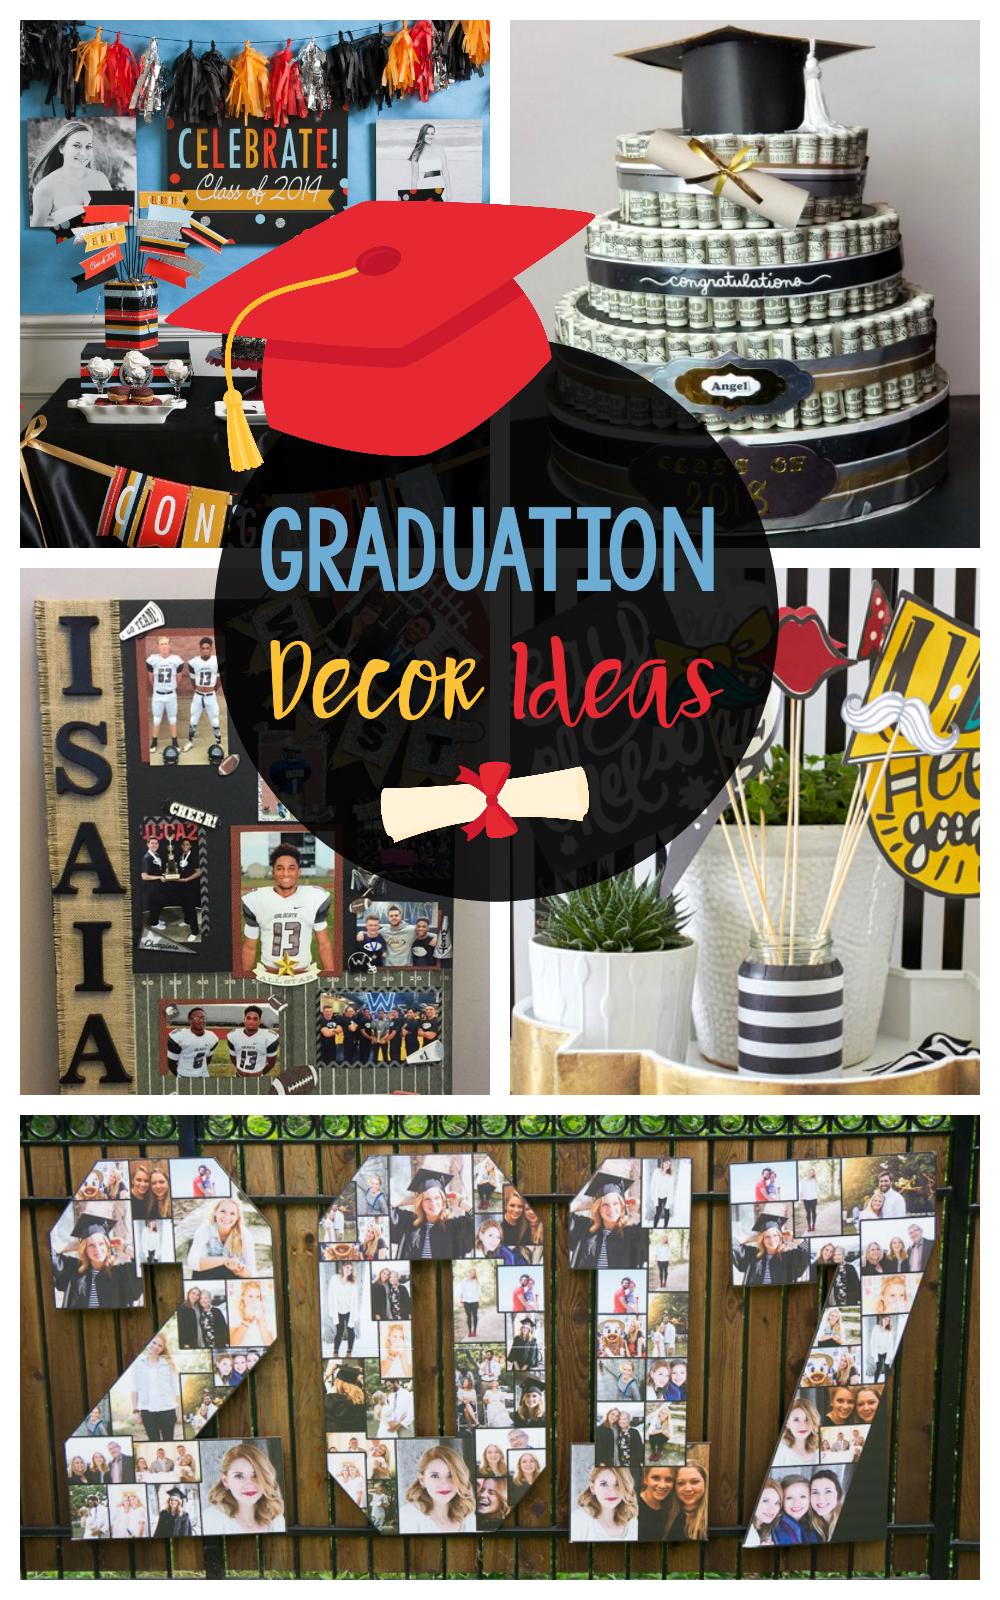 Fun Diy Graduation Decorations Fun Squared In 2020 Graduation Diy Diy Graduation Decorations Graduation Decorations